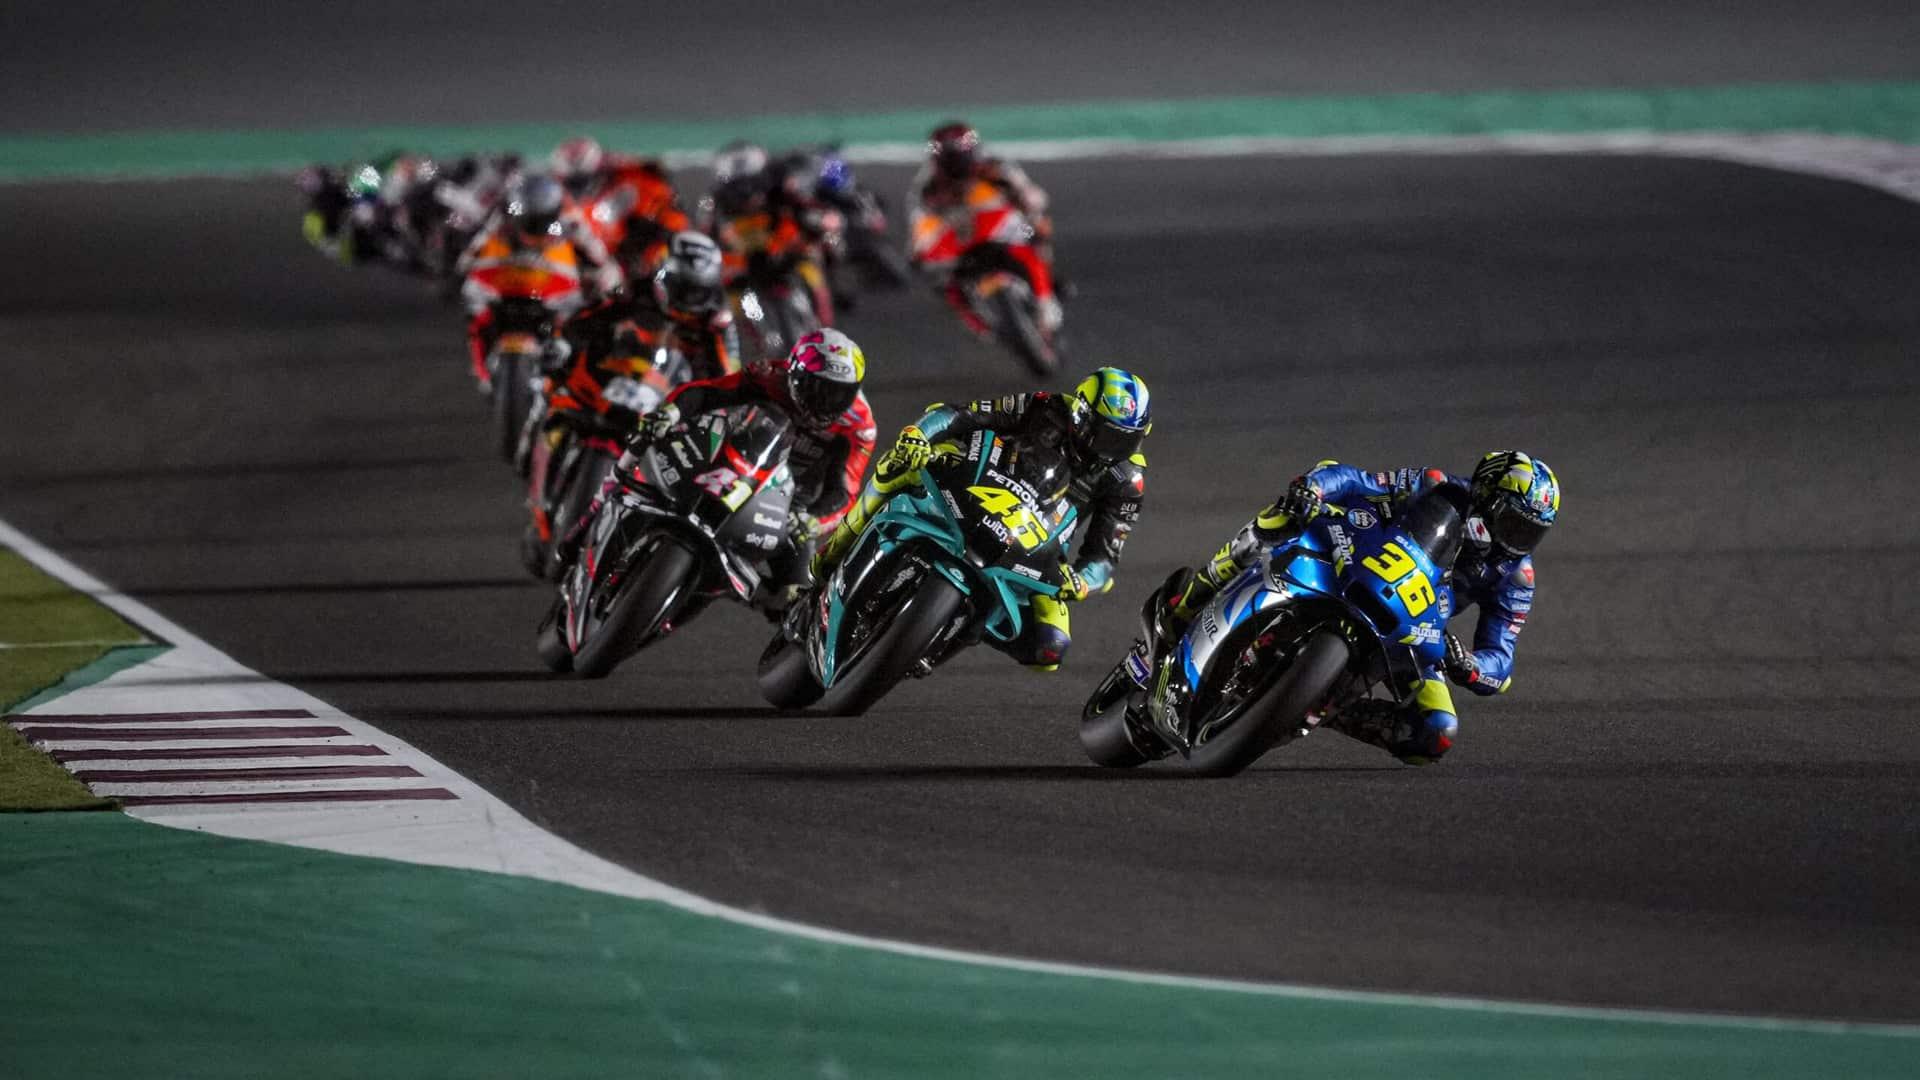 MotoGP en Movistar a través de DAZN